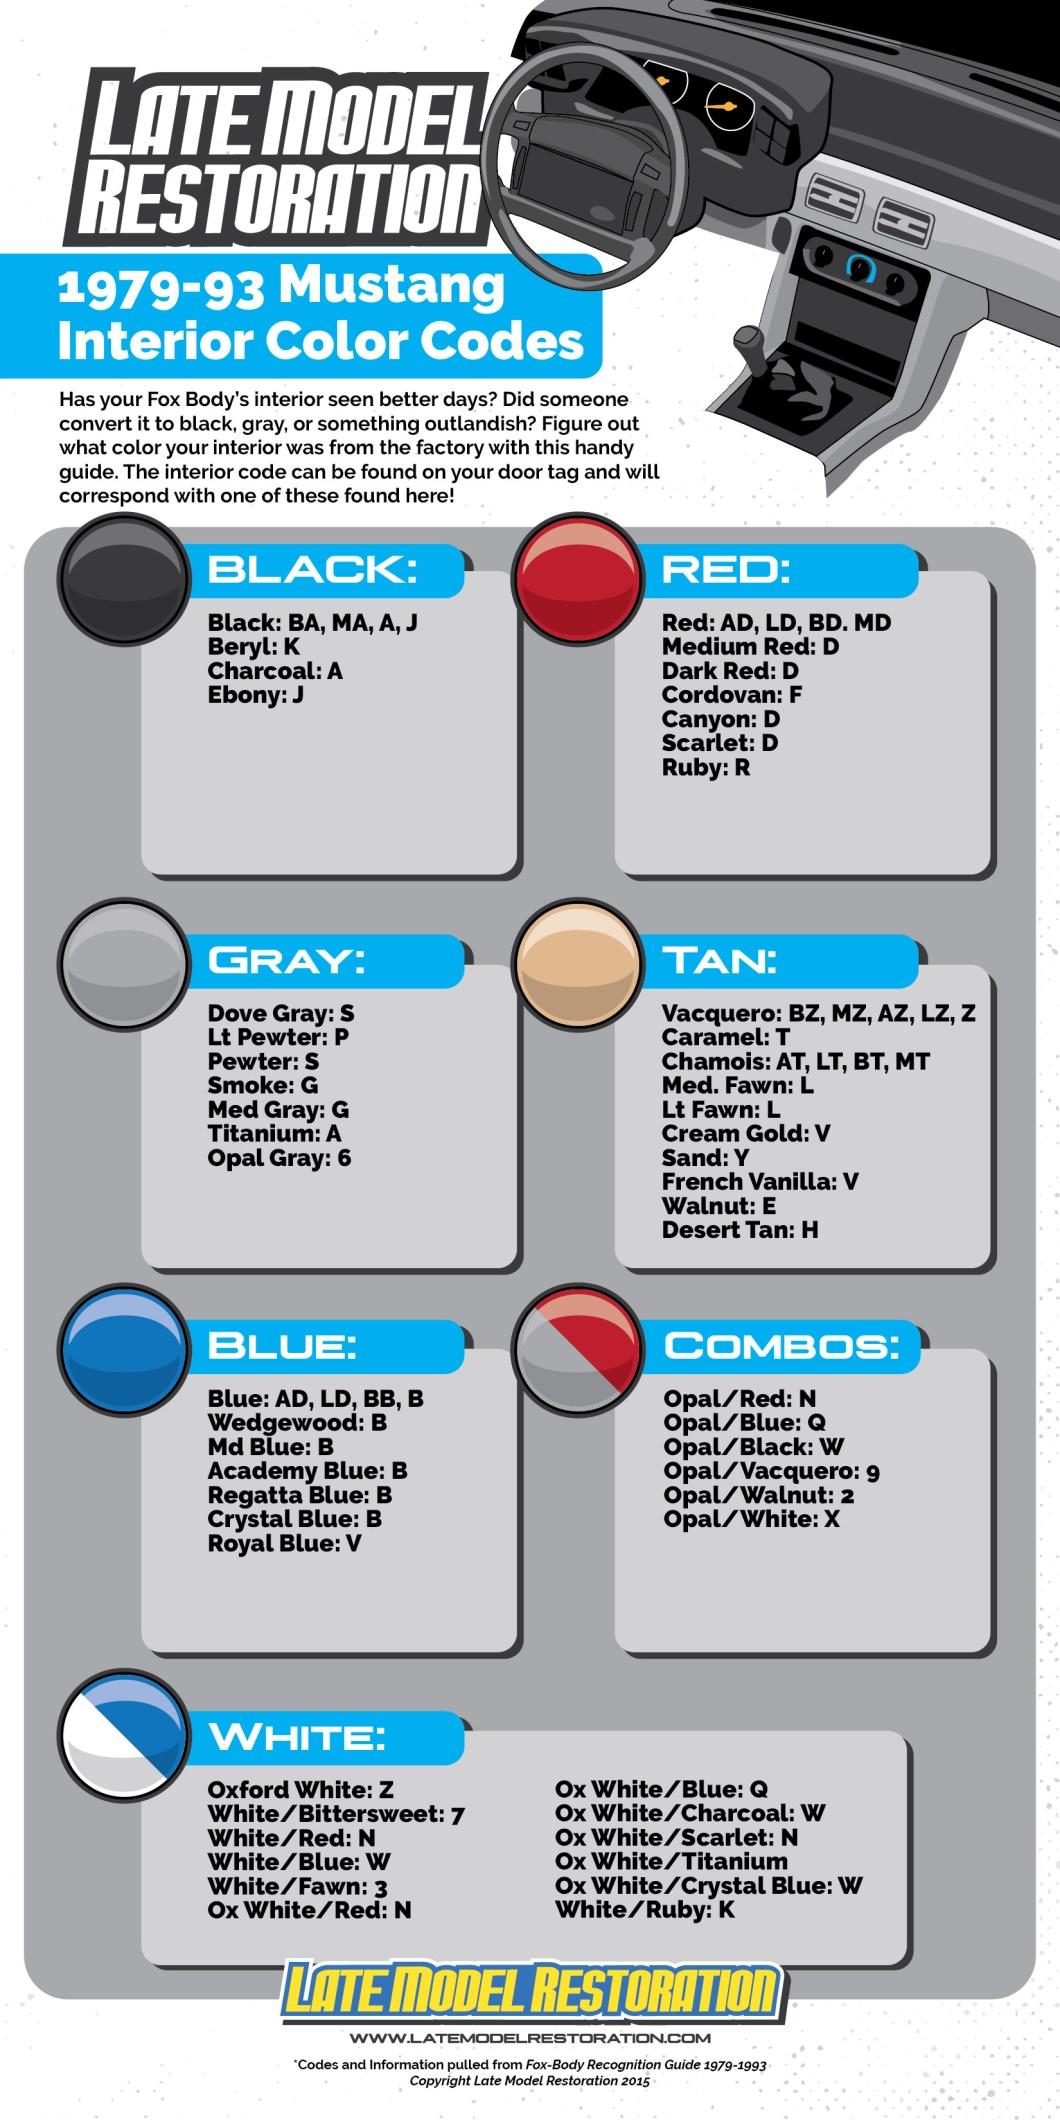 Fox Body Interior Color Codes Guide